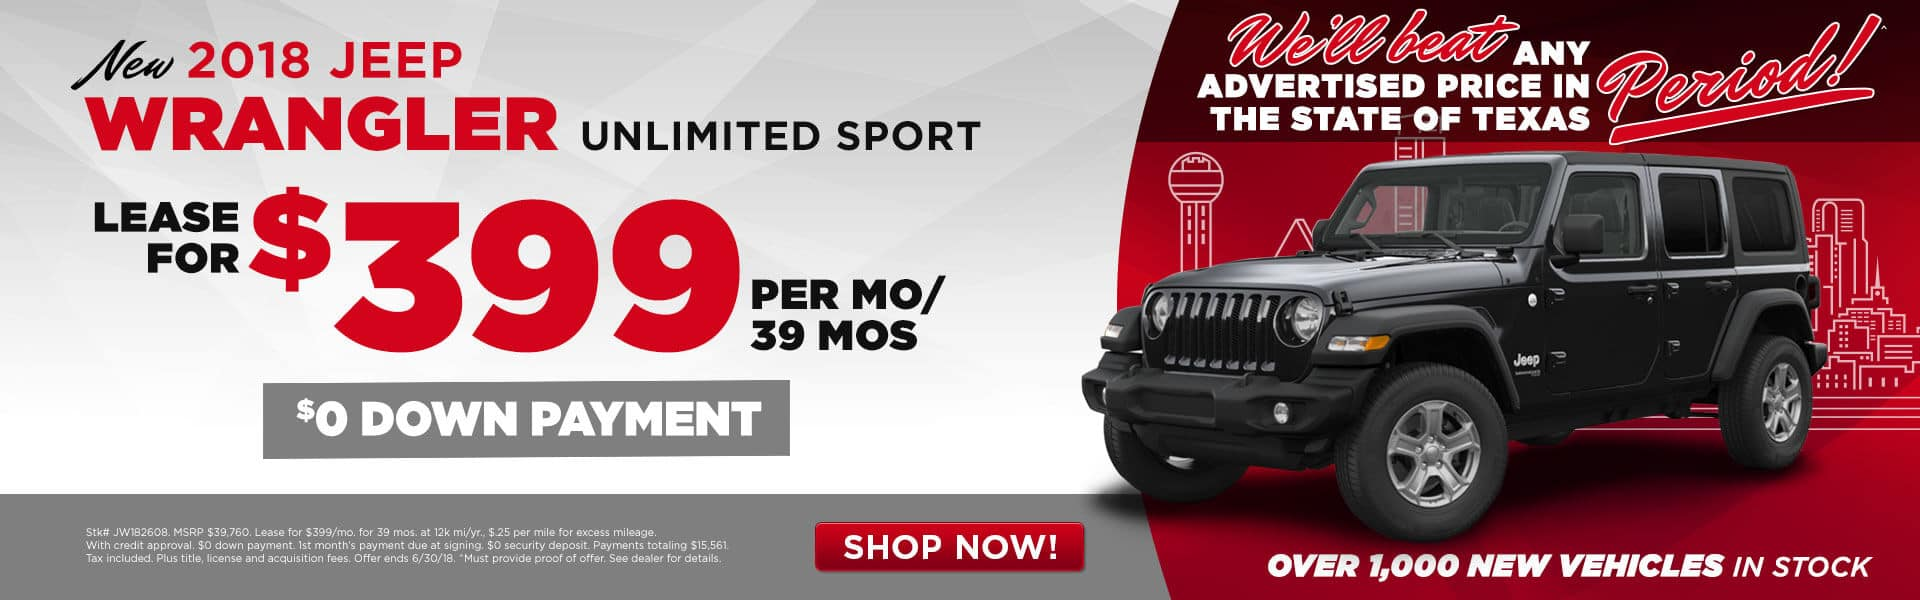 Used Jeep Grand Cherokee Near Me >> Car Dealerships Dallas TX | Dallas Dodge